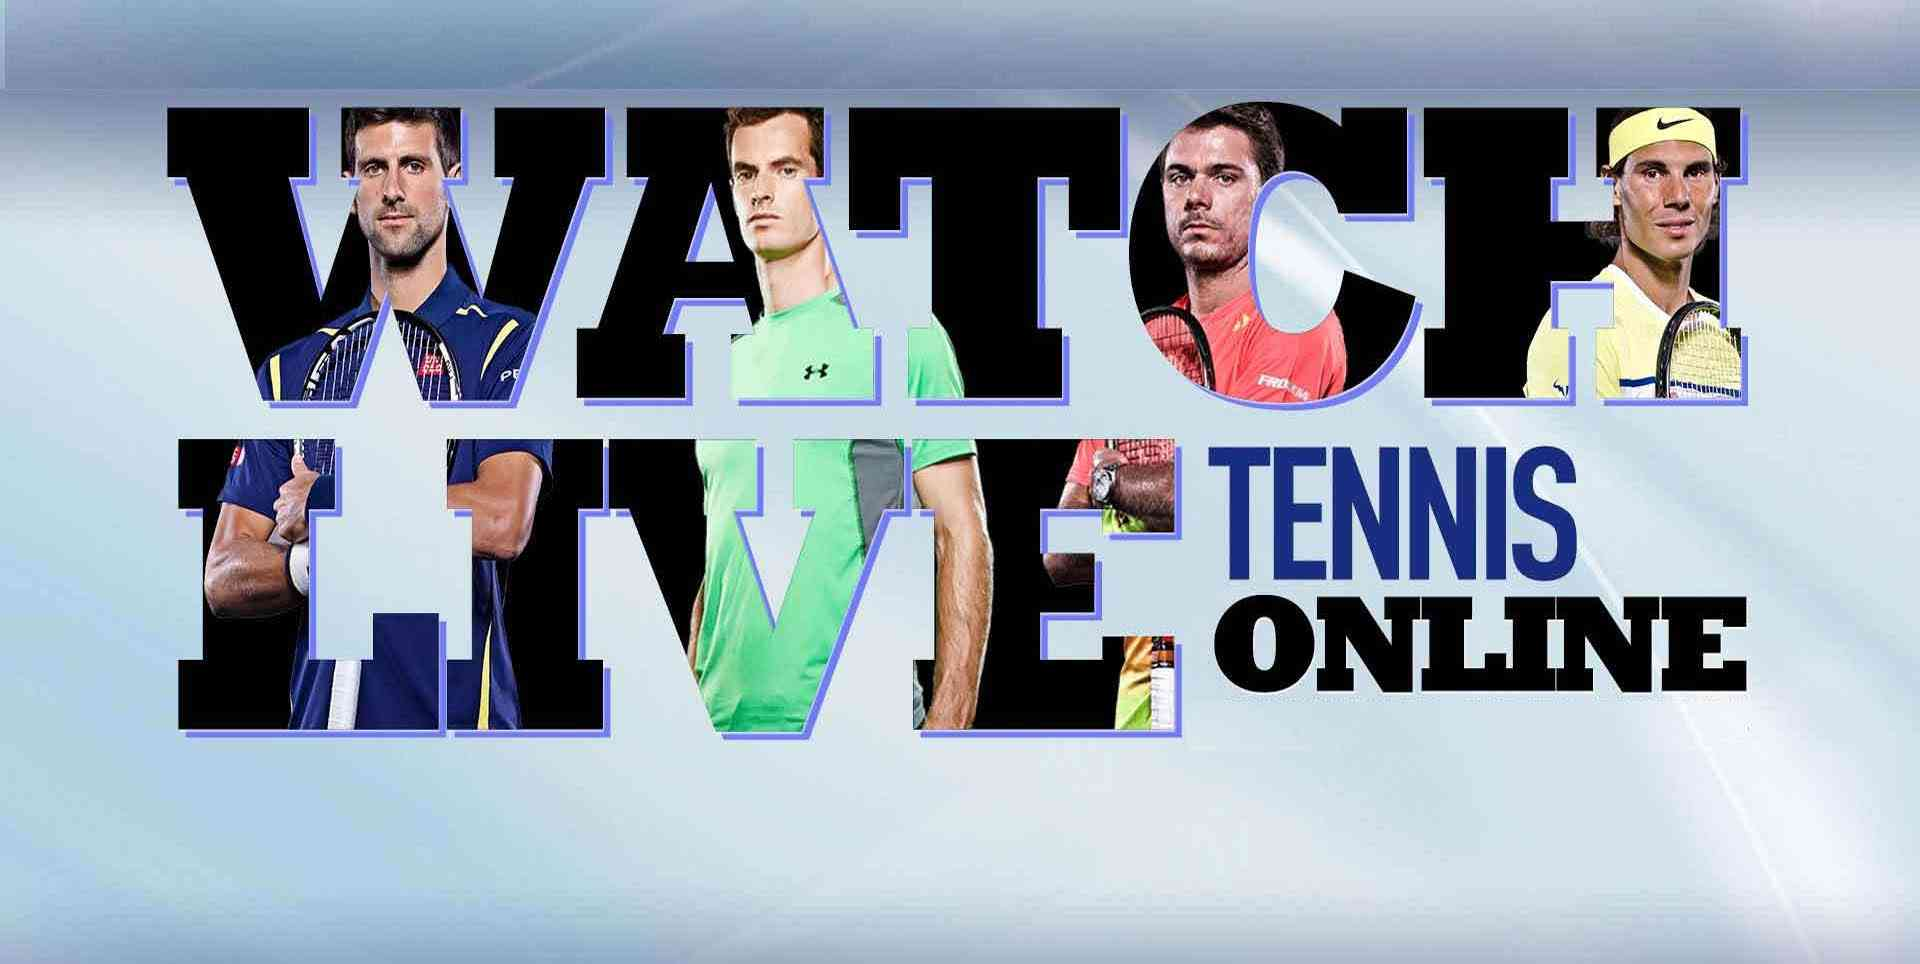 Watch J. Isner vs M. Baghdatis Mens Singles Quarterfinals Online 2013